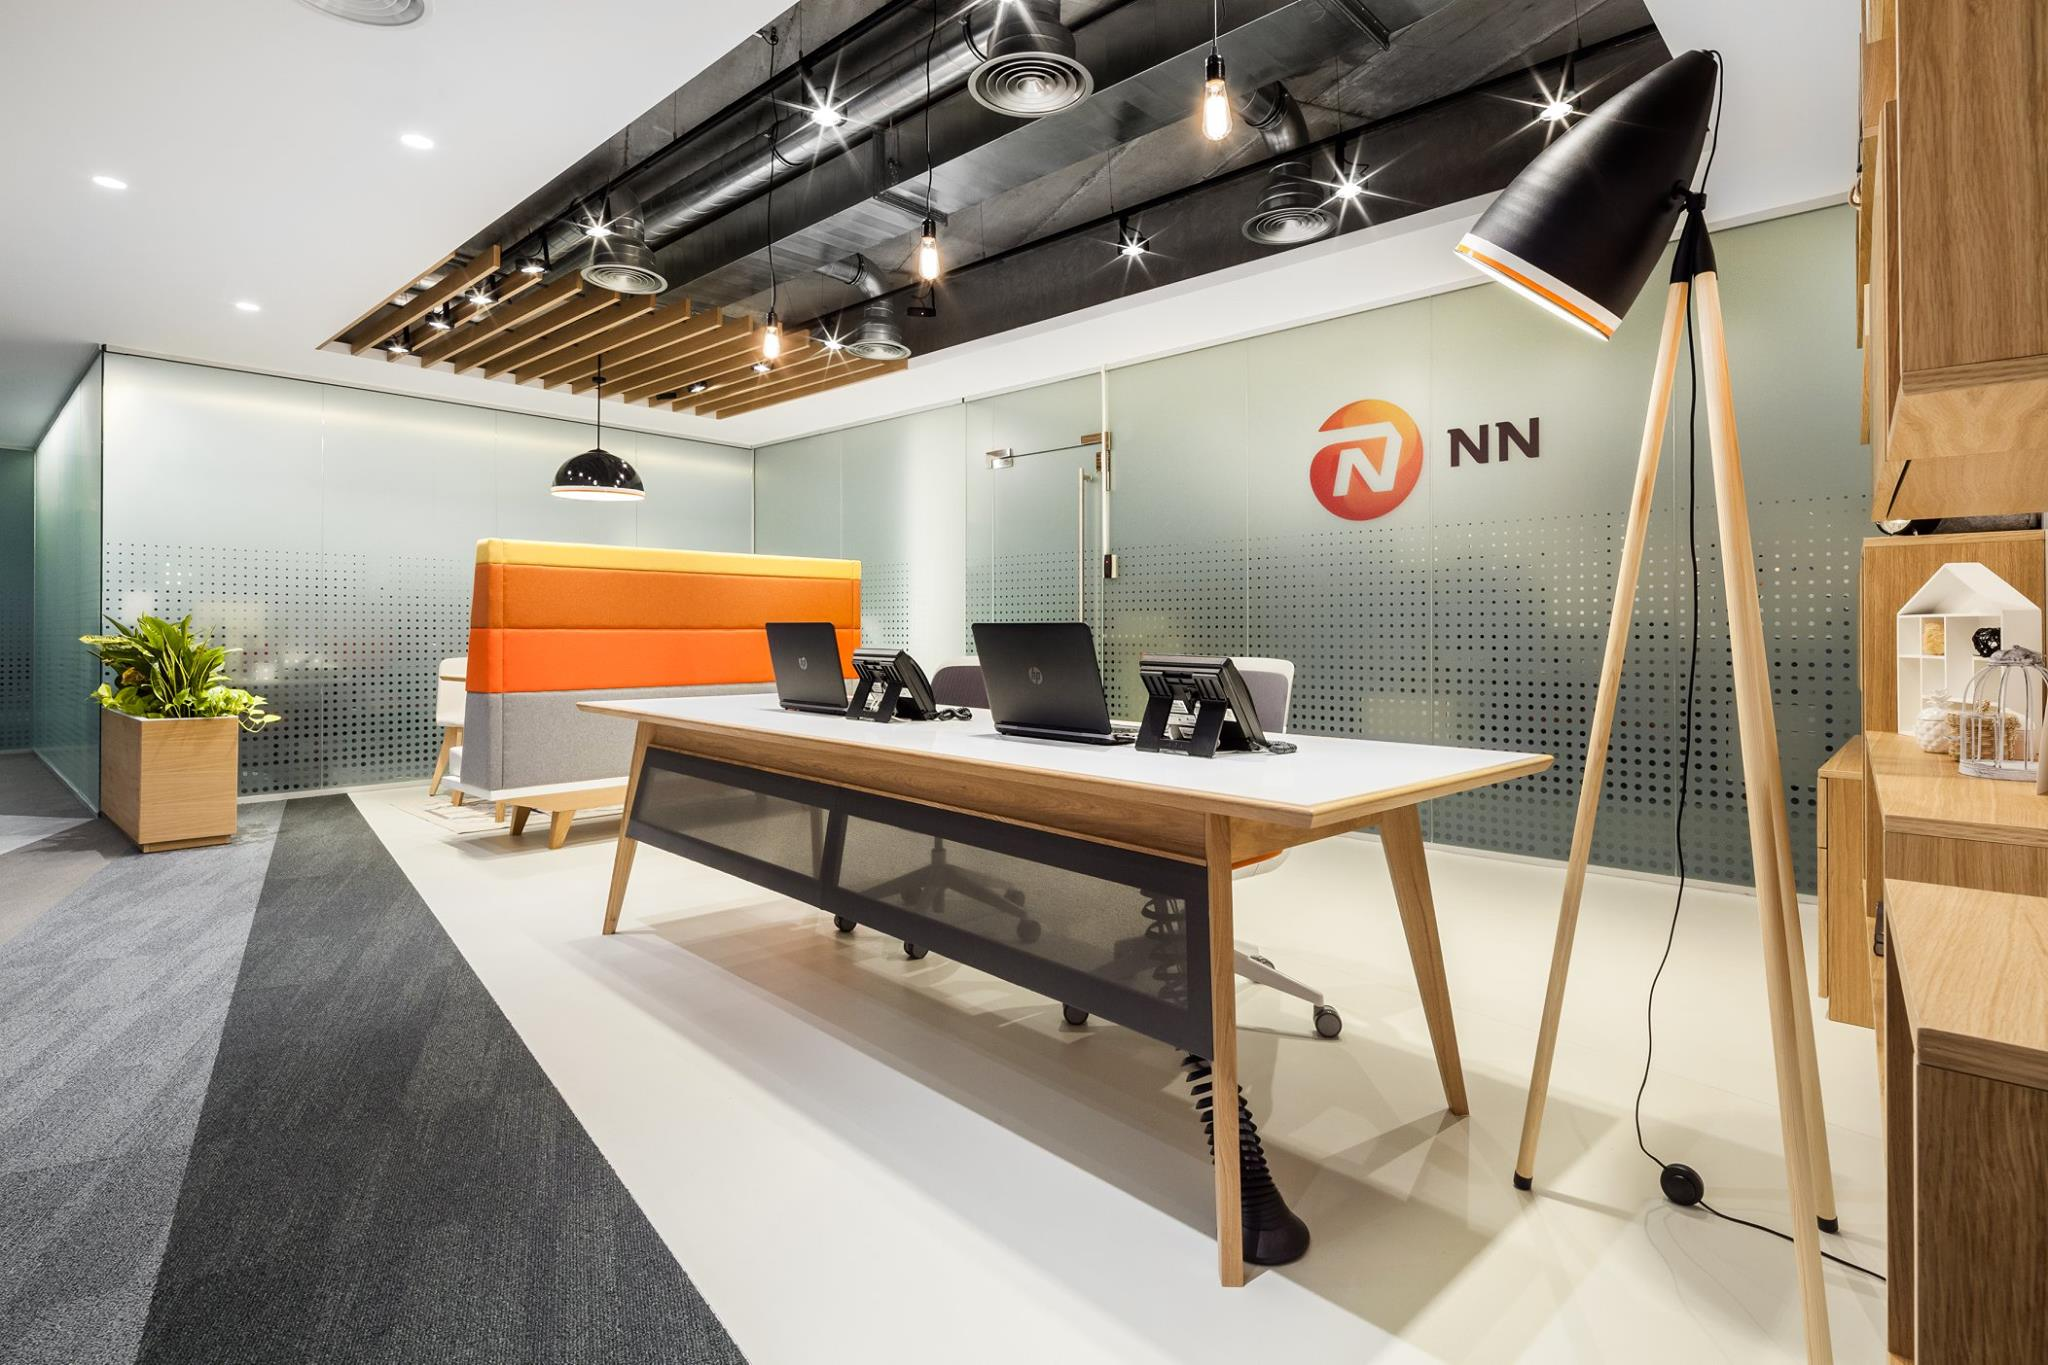 ING-NN-Receptie-Opera-center-Trivenus-AMA-Design_05